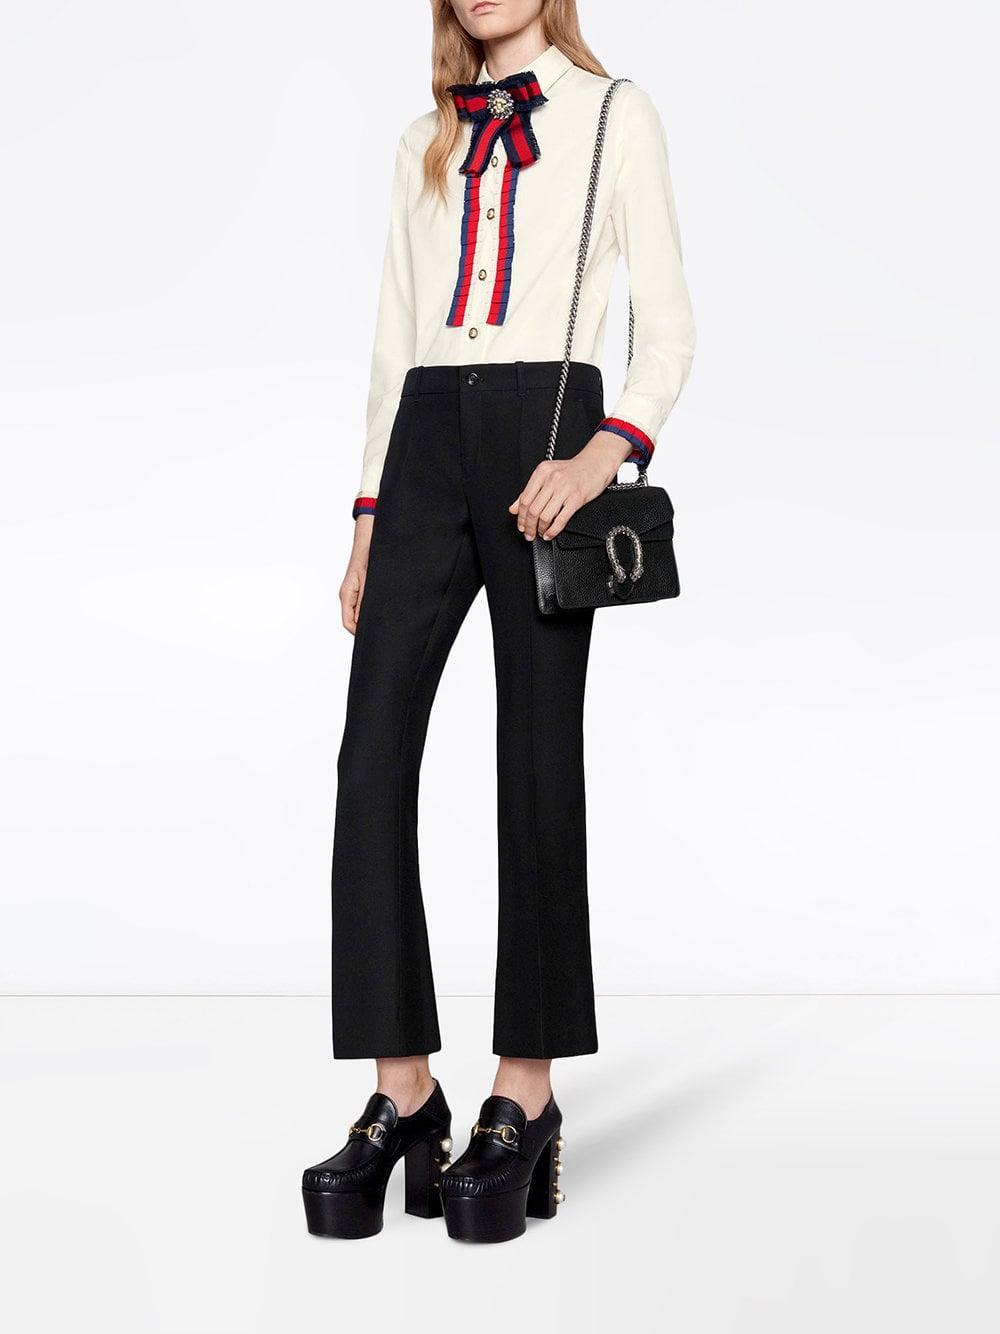 84ec014d225c Gucci Black Dionysus Mini Leather Bag in Black - Save 10% - Lyst